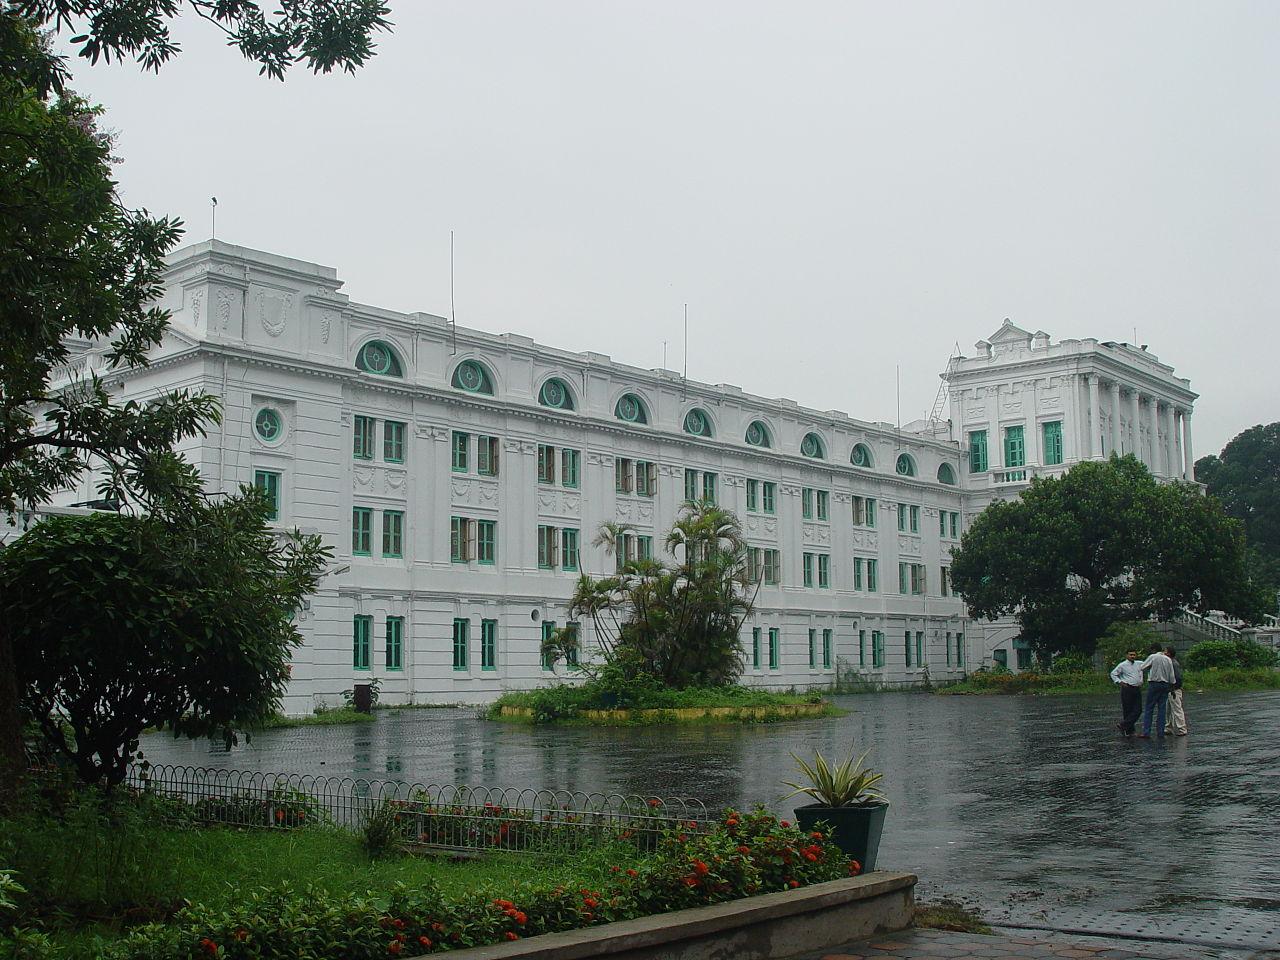 Kolkata S Colonial Architecture In 6 Impressive Buildings